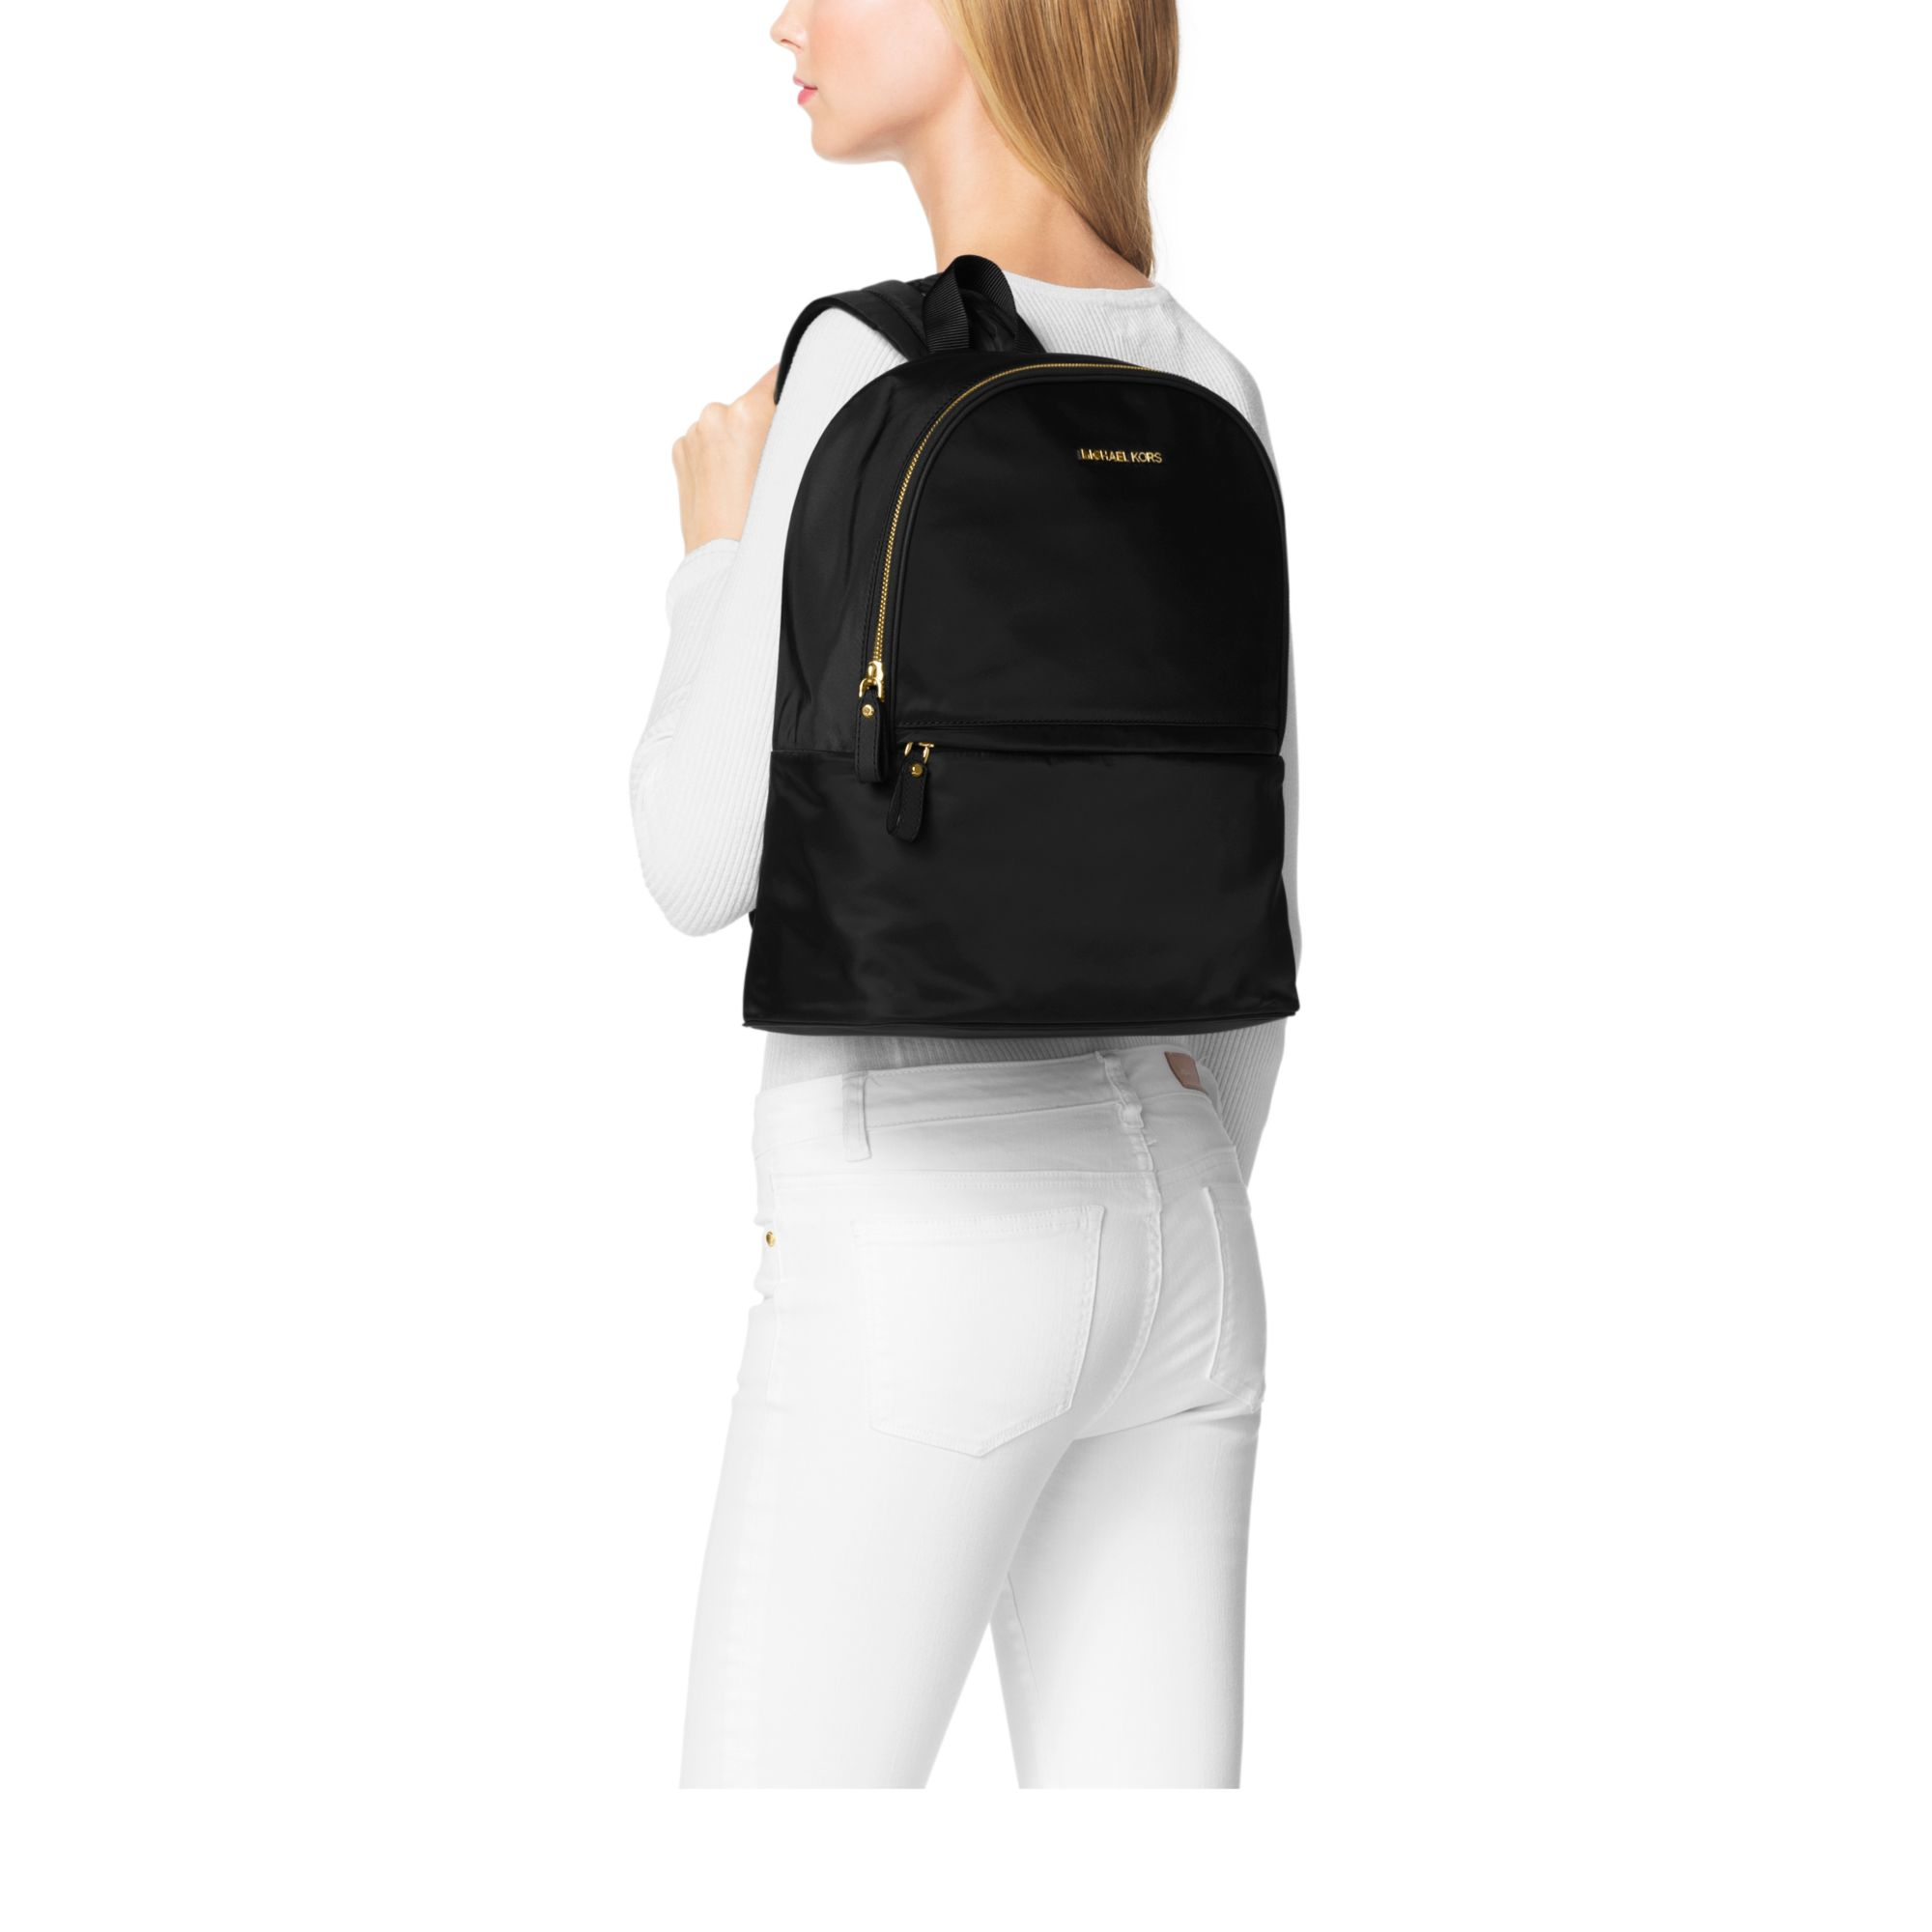 d205fb3f360c Michael Kors Kieran Large Nylon Backpack in Black - Lyst